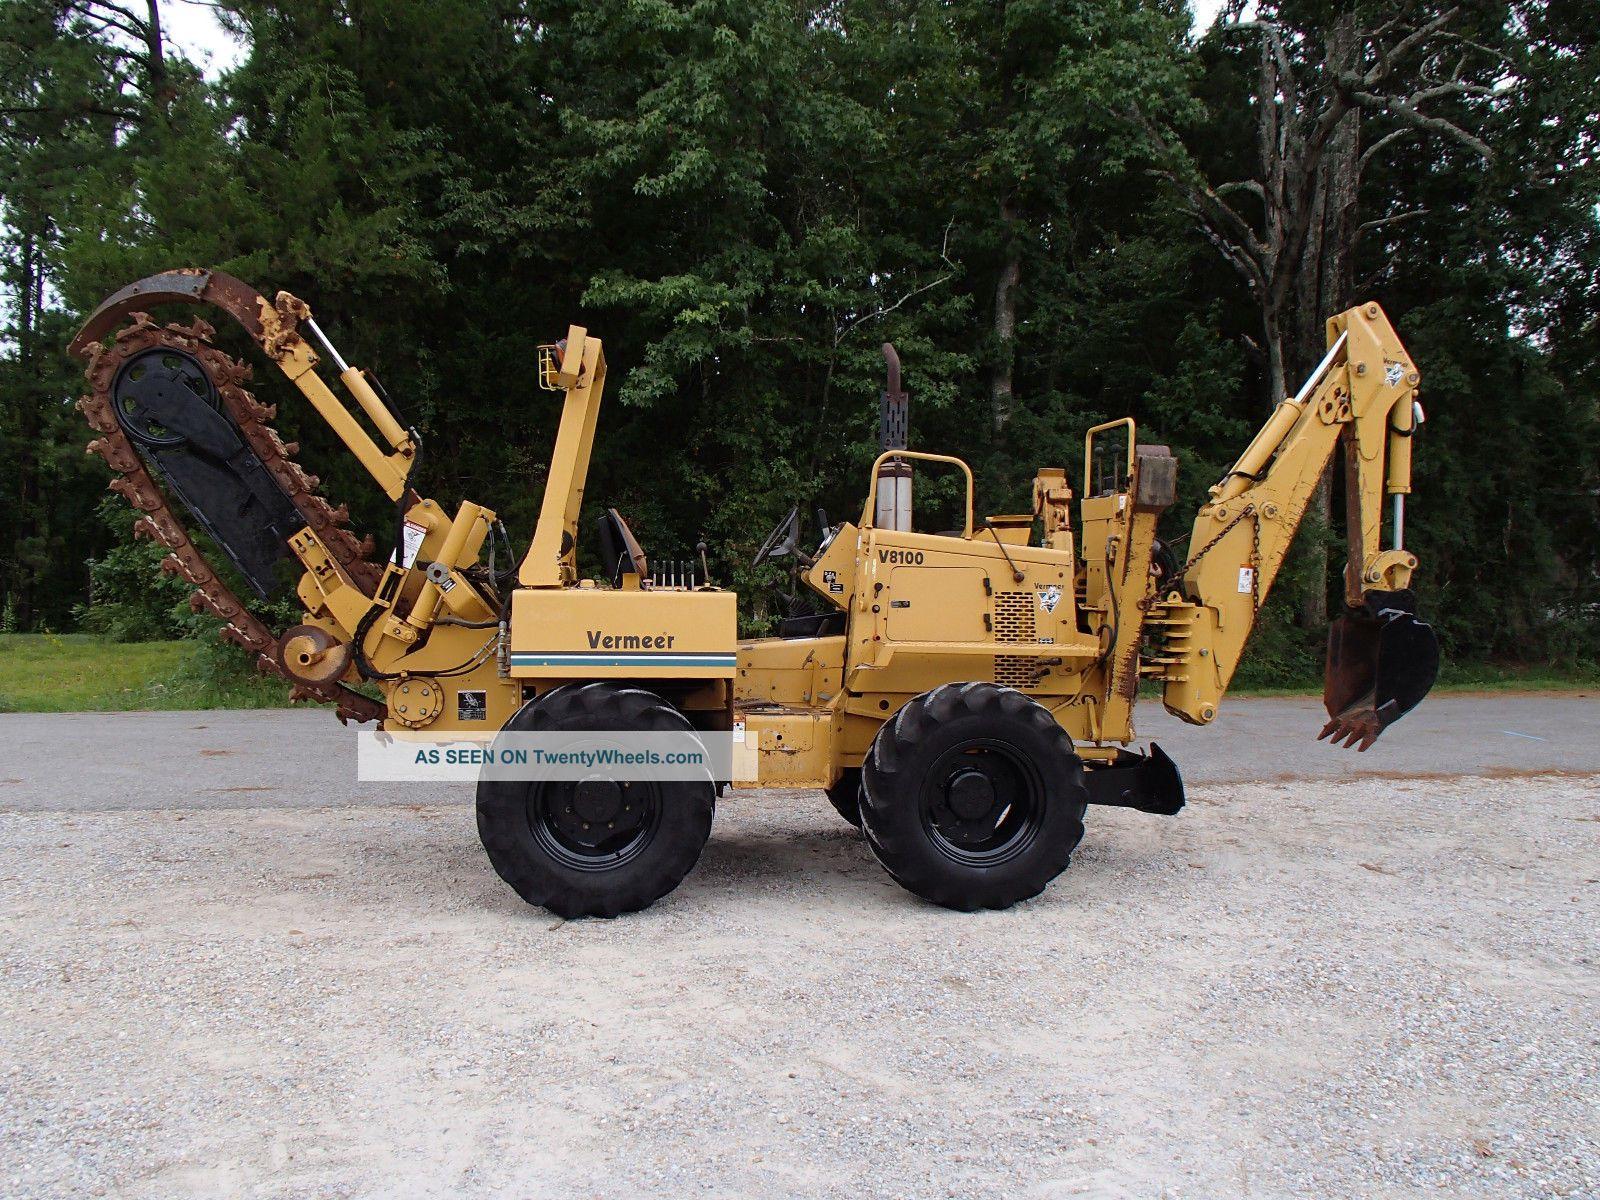 2003 Vermeer V8100 Trencher / Backhoe Construction Heavy Equipment Trenchers - Riding photo